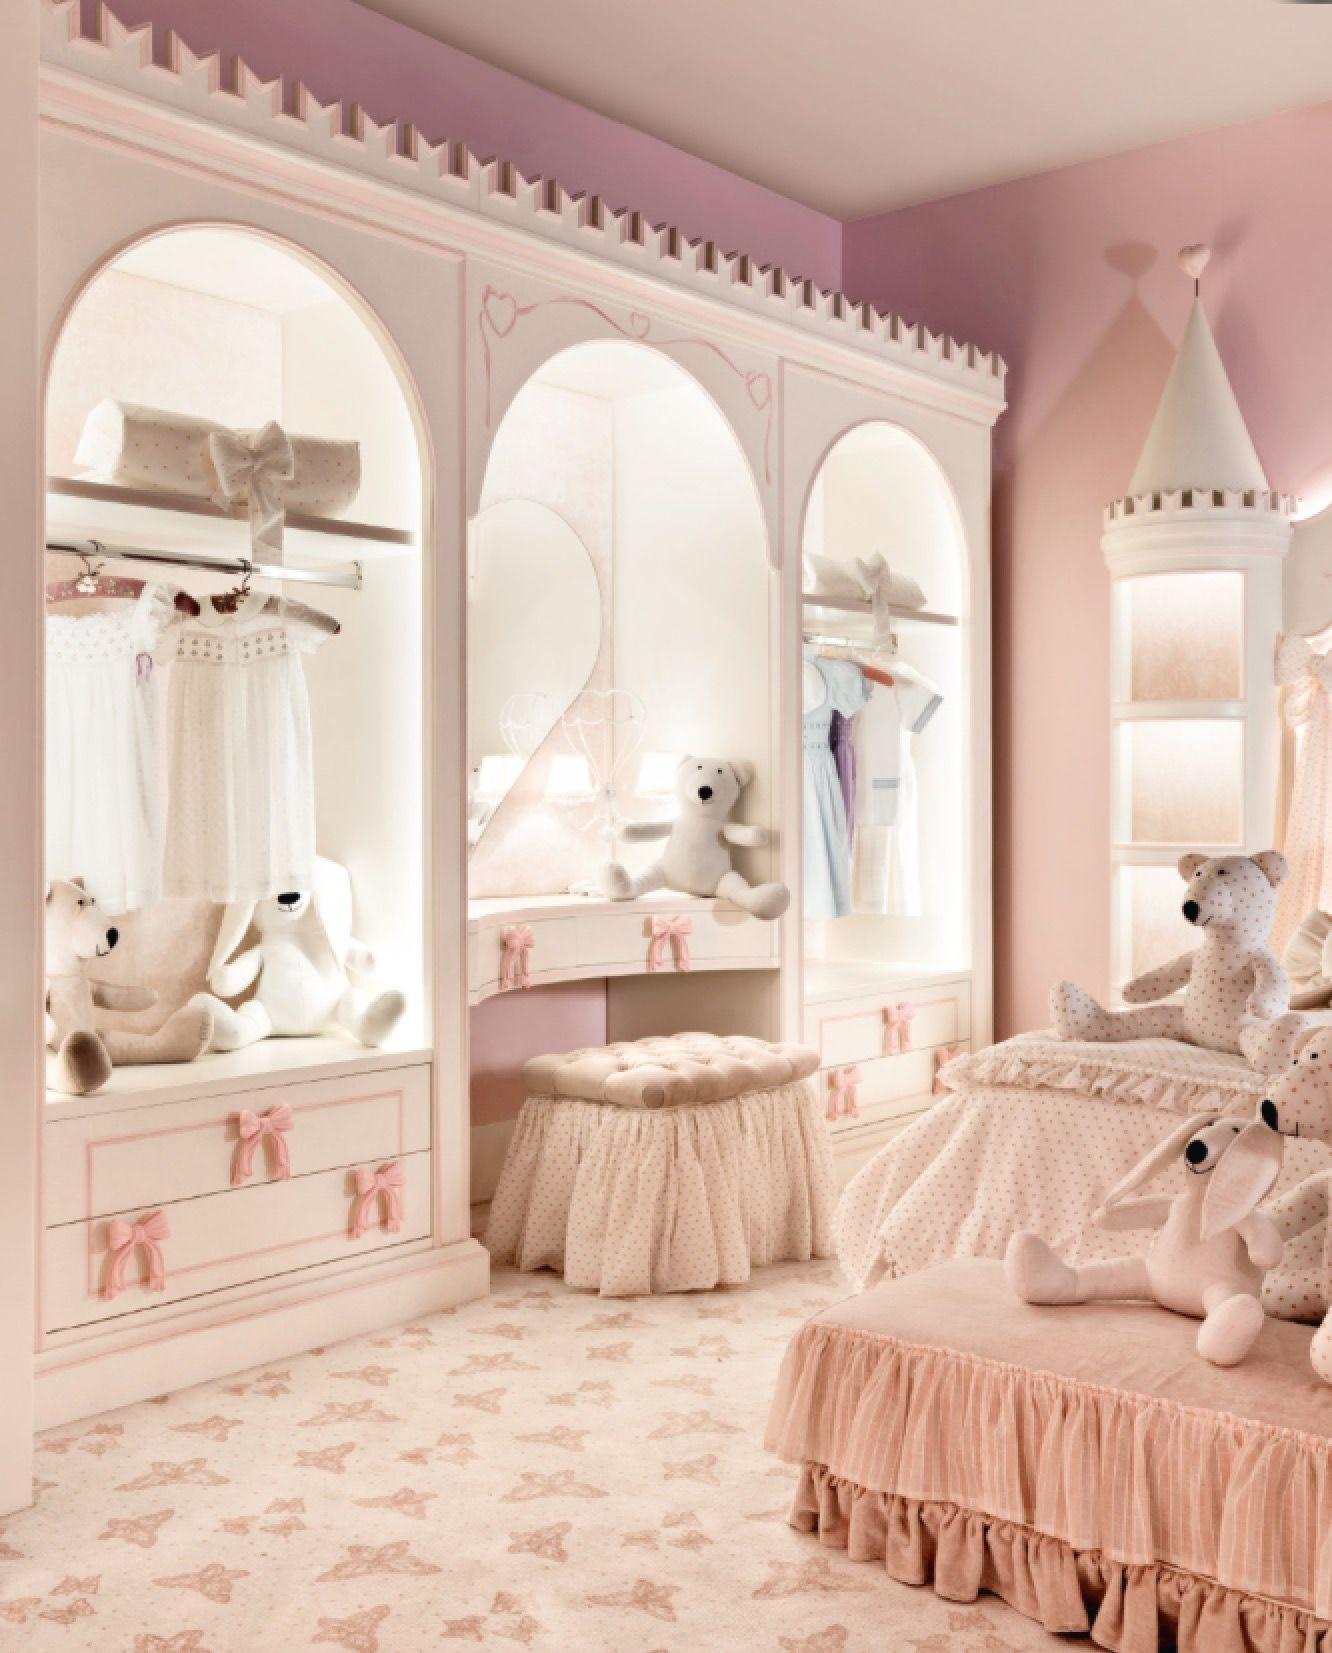 Very practical yet very cute | Pink bedroom decor ...